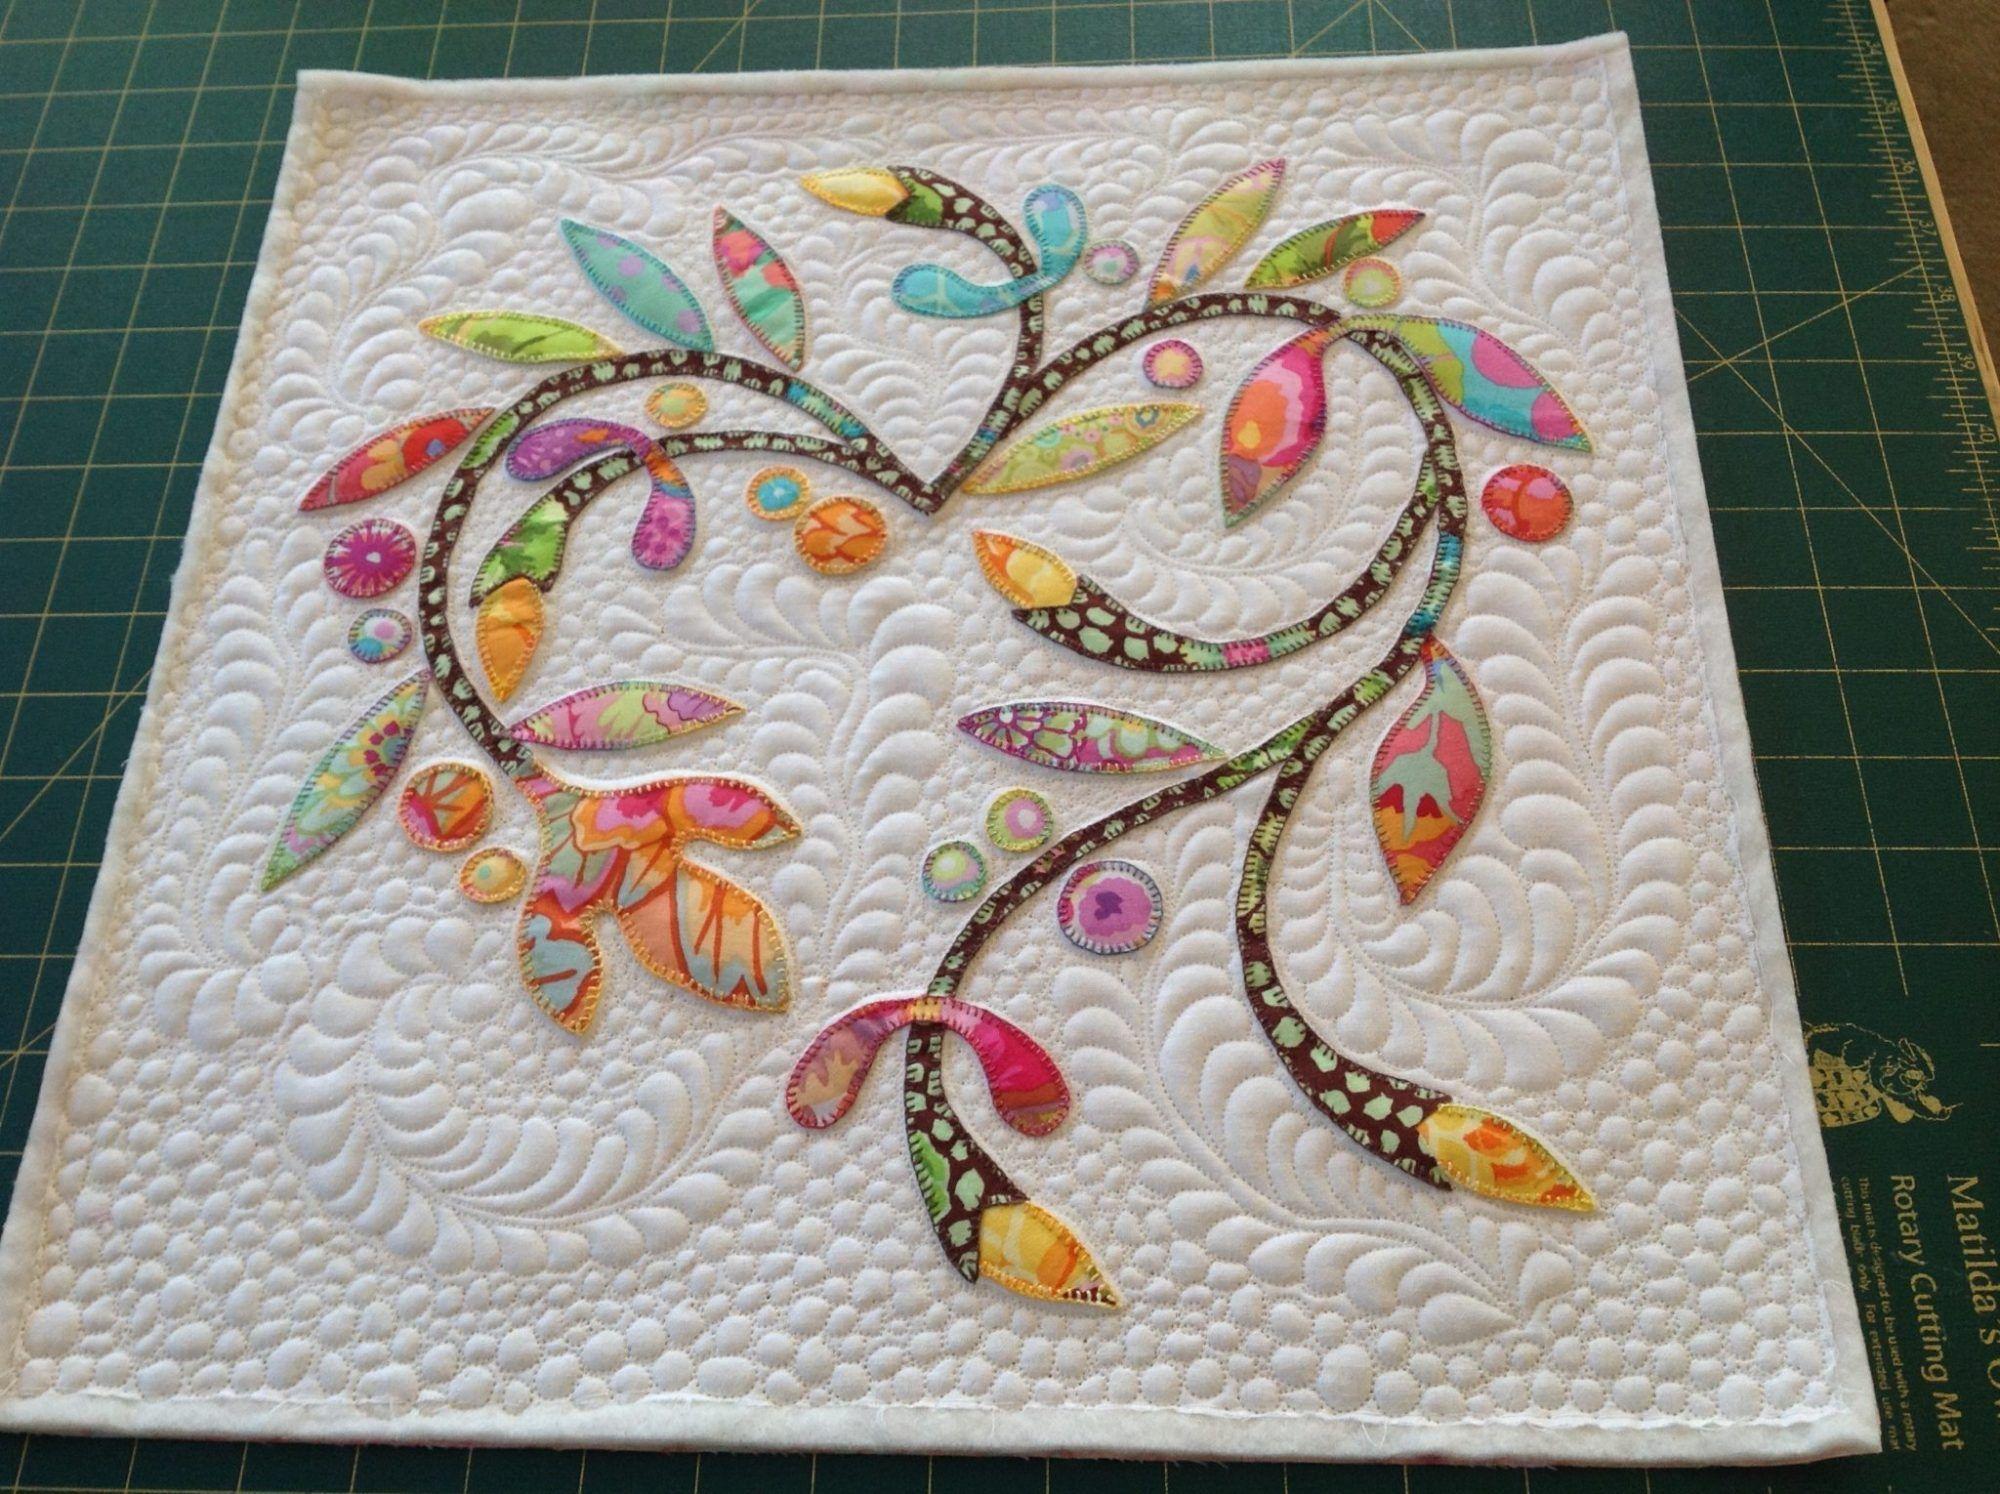 Spring time applique mini quilt quilting aplicación patchwork